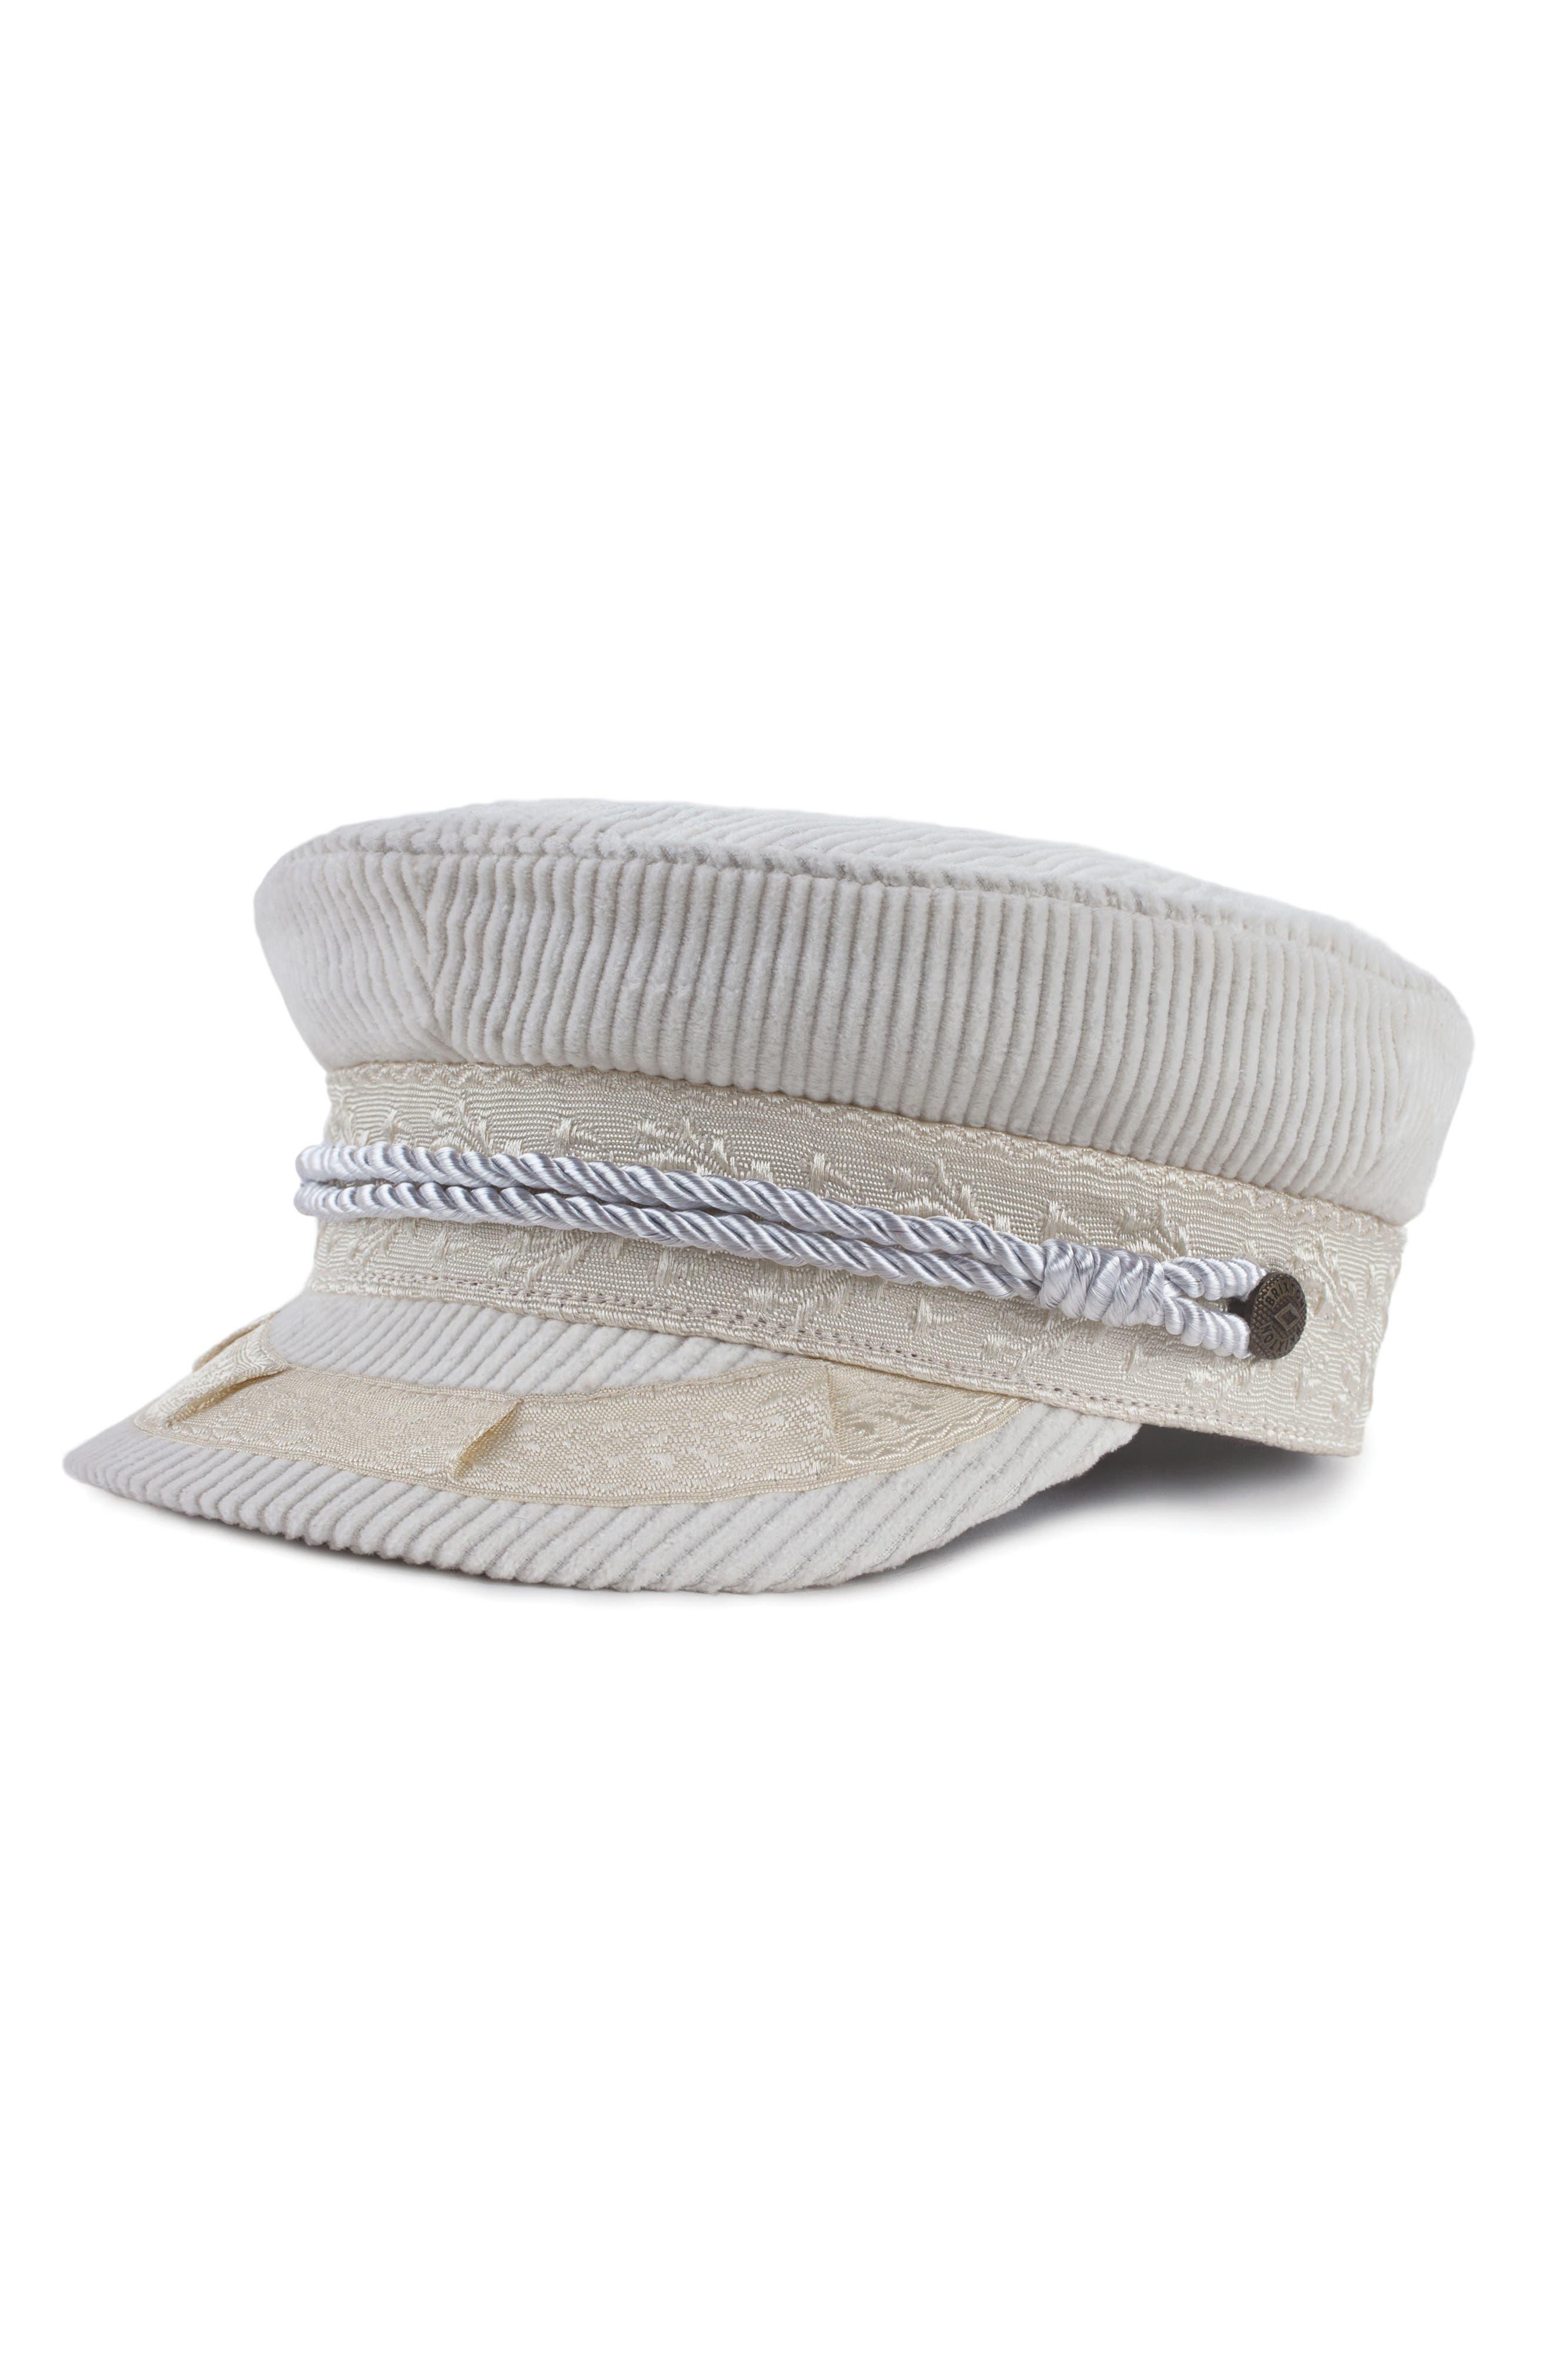 ALBANY CORDUROY FISHERMAN CAP - WHITE